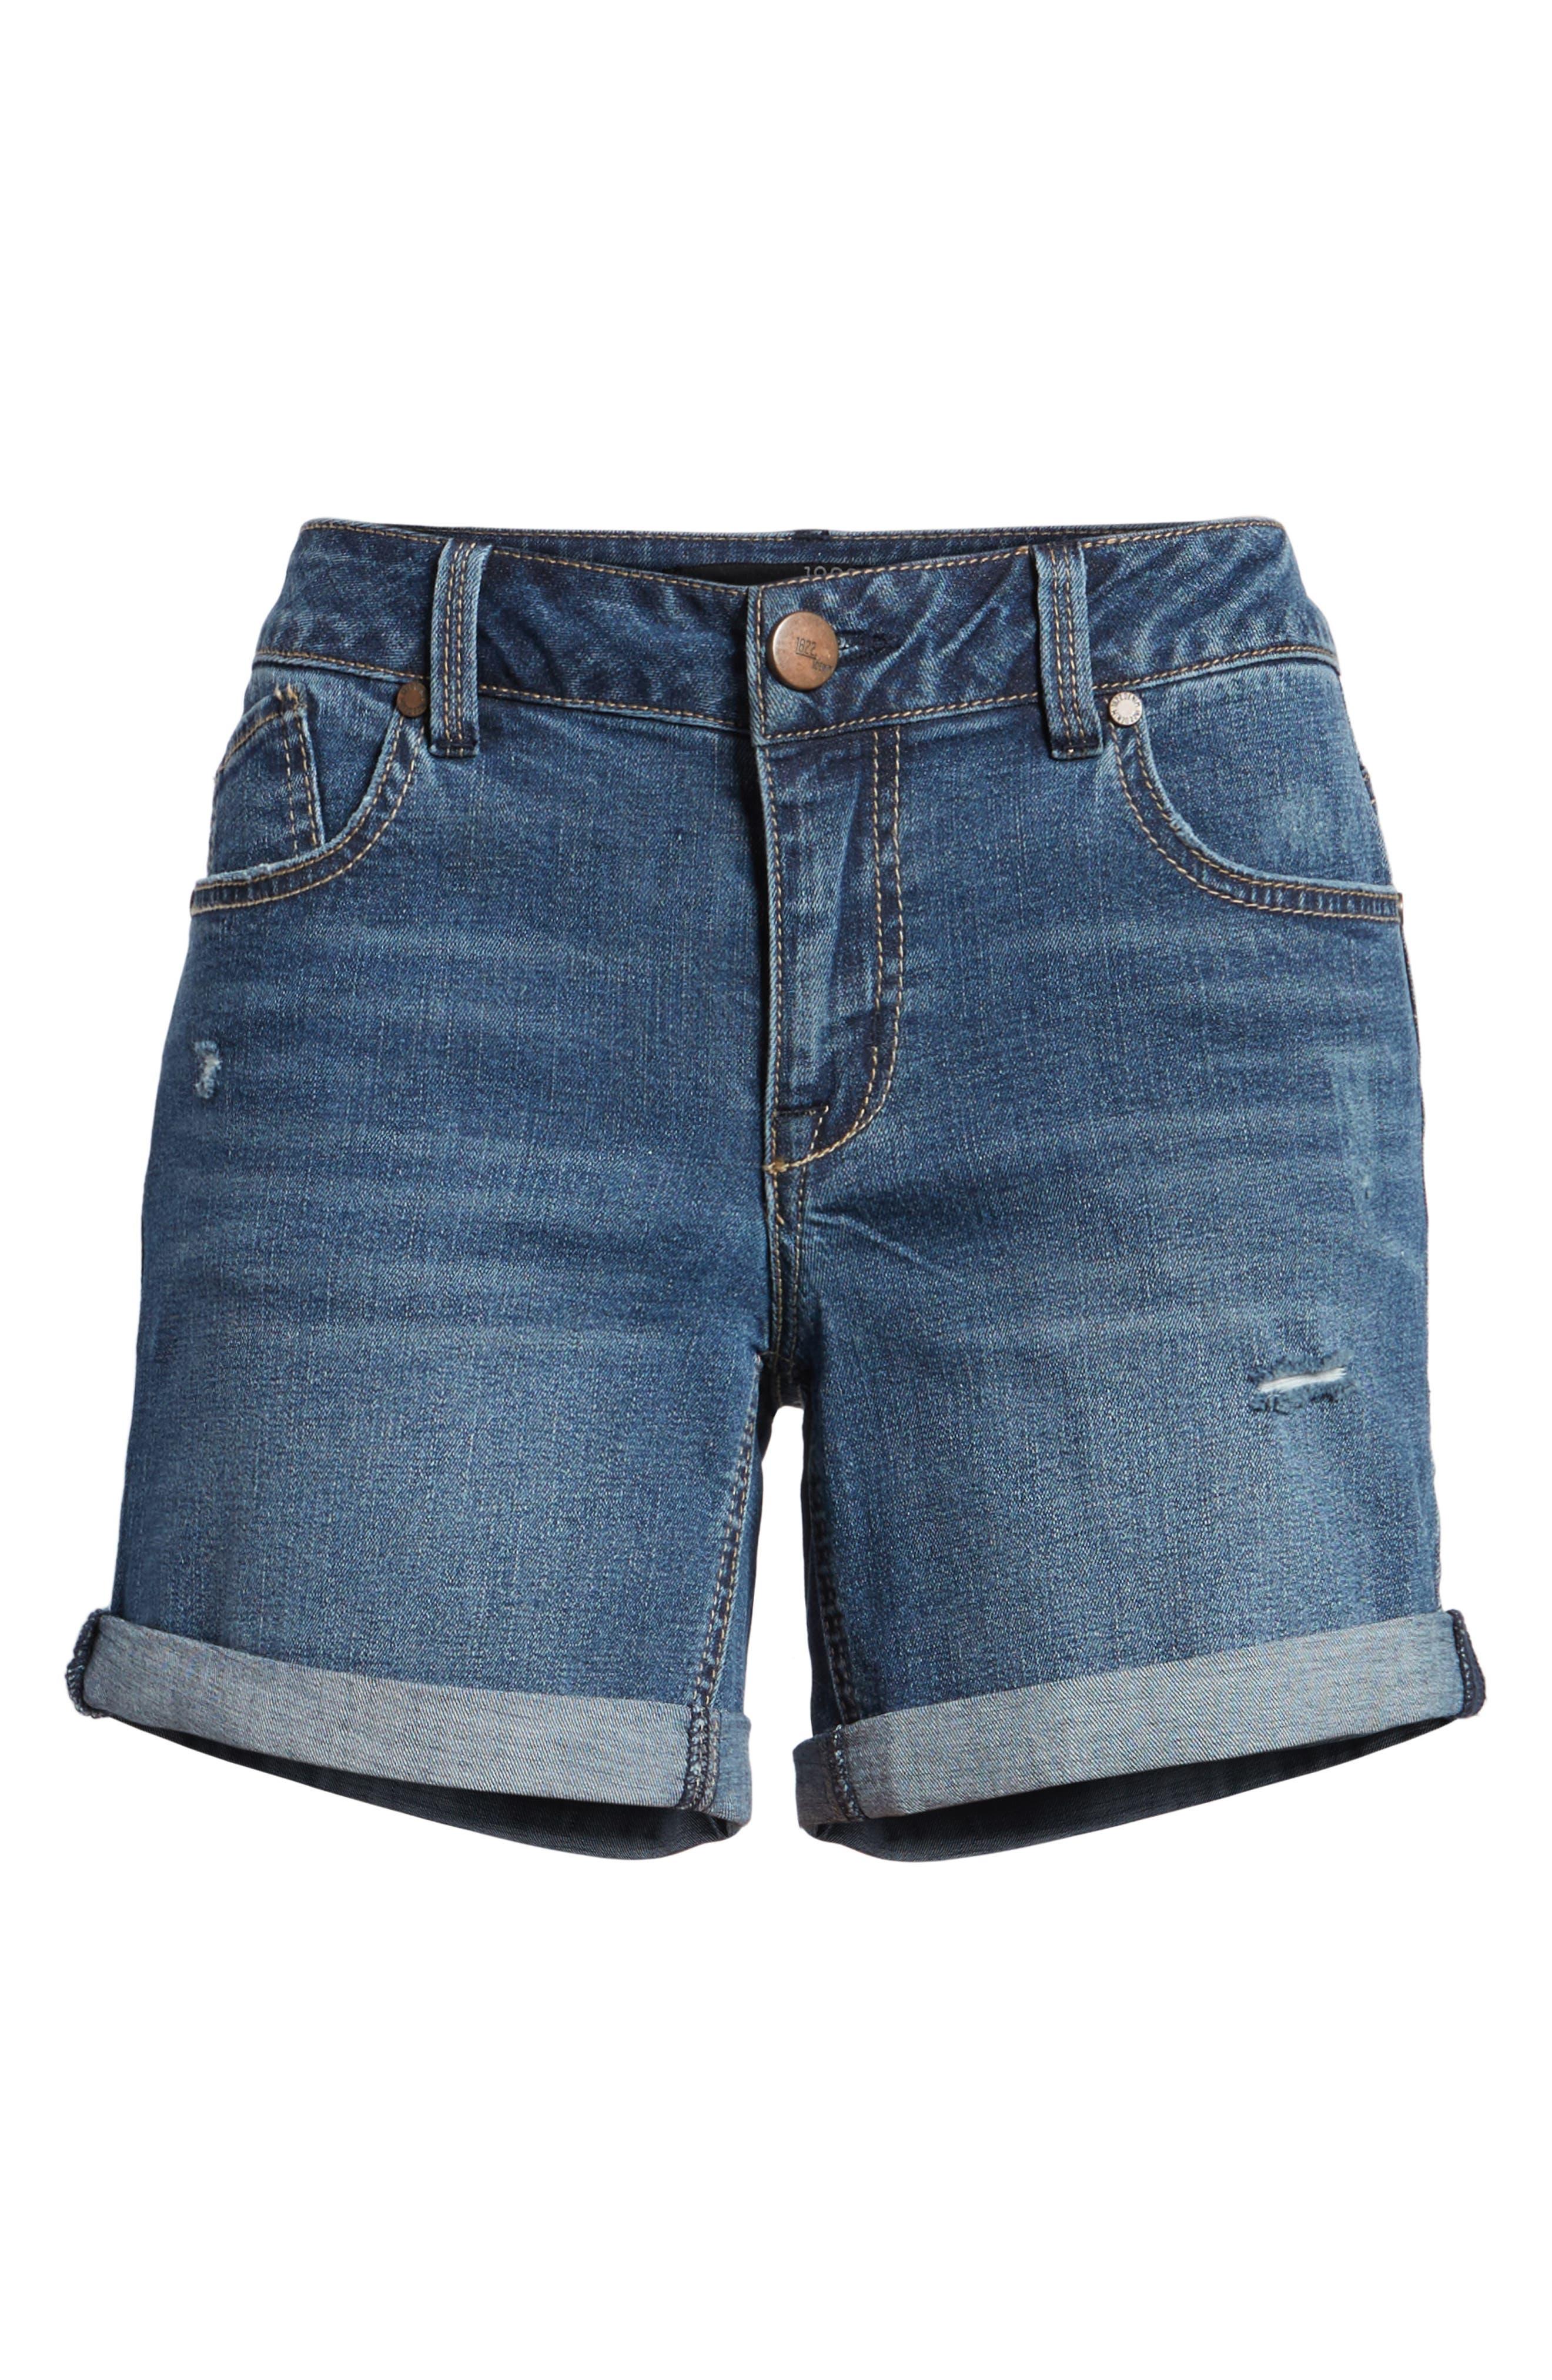 Roll Cuff Denim Shorts,                             Alternate thumbnail 6, color,                             Sublime